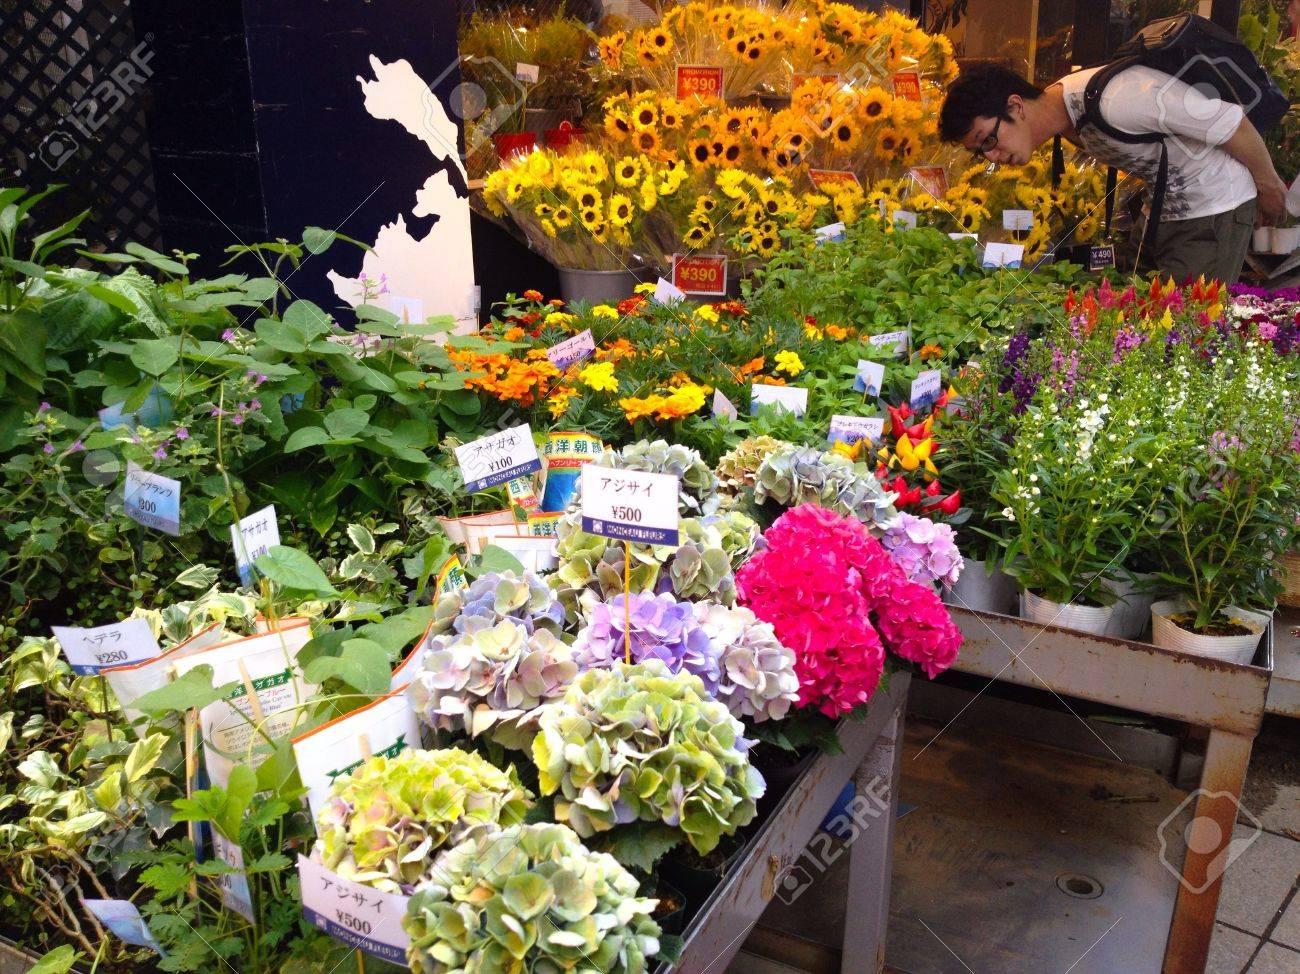 Beautiful flower shop in jiyugaoka tokyo japan stock photo beautiful flower shop in jiyugaoka tokyo japan stock photo 29359661 izmirmasajfo Gallery